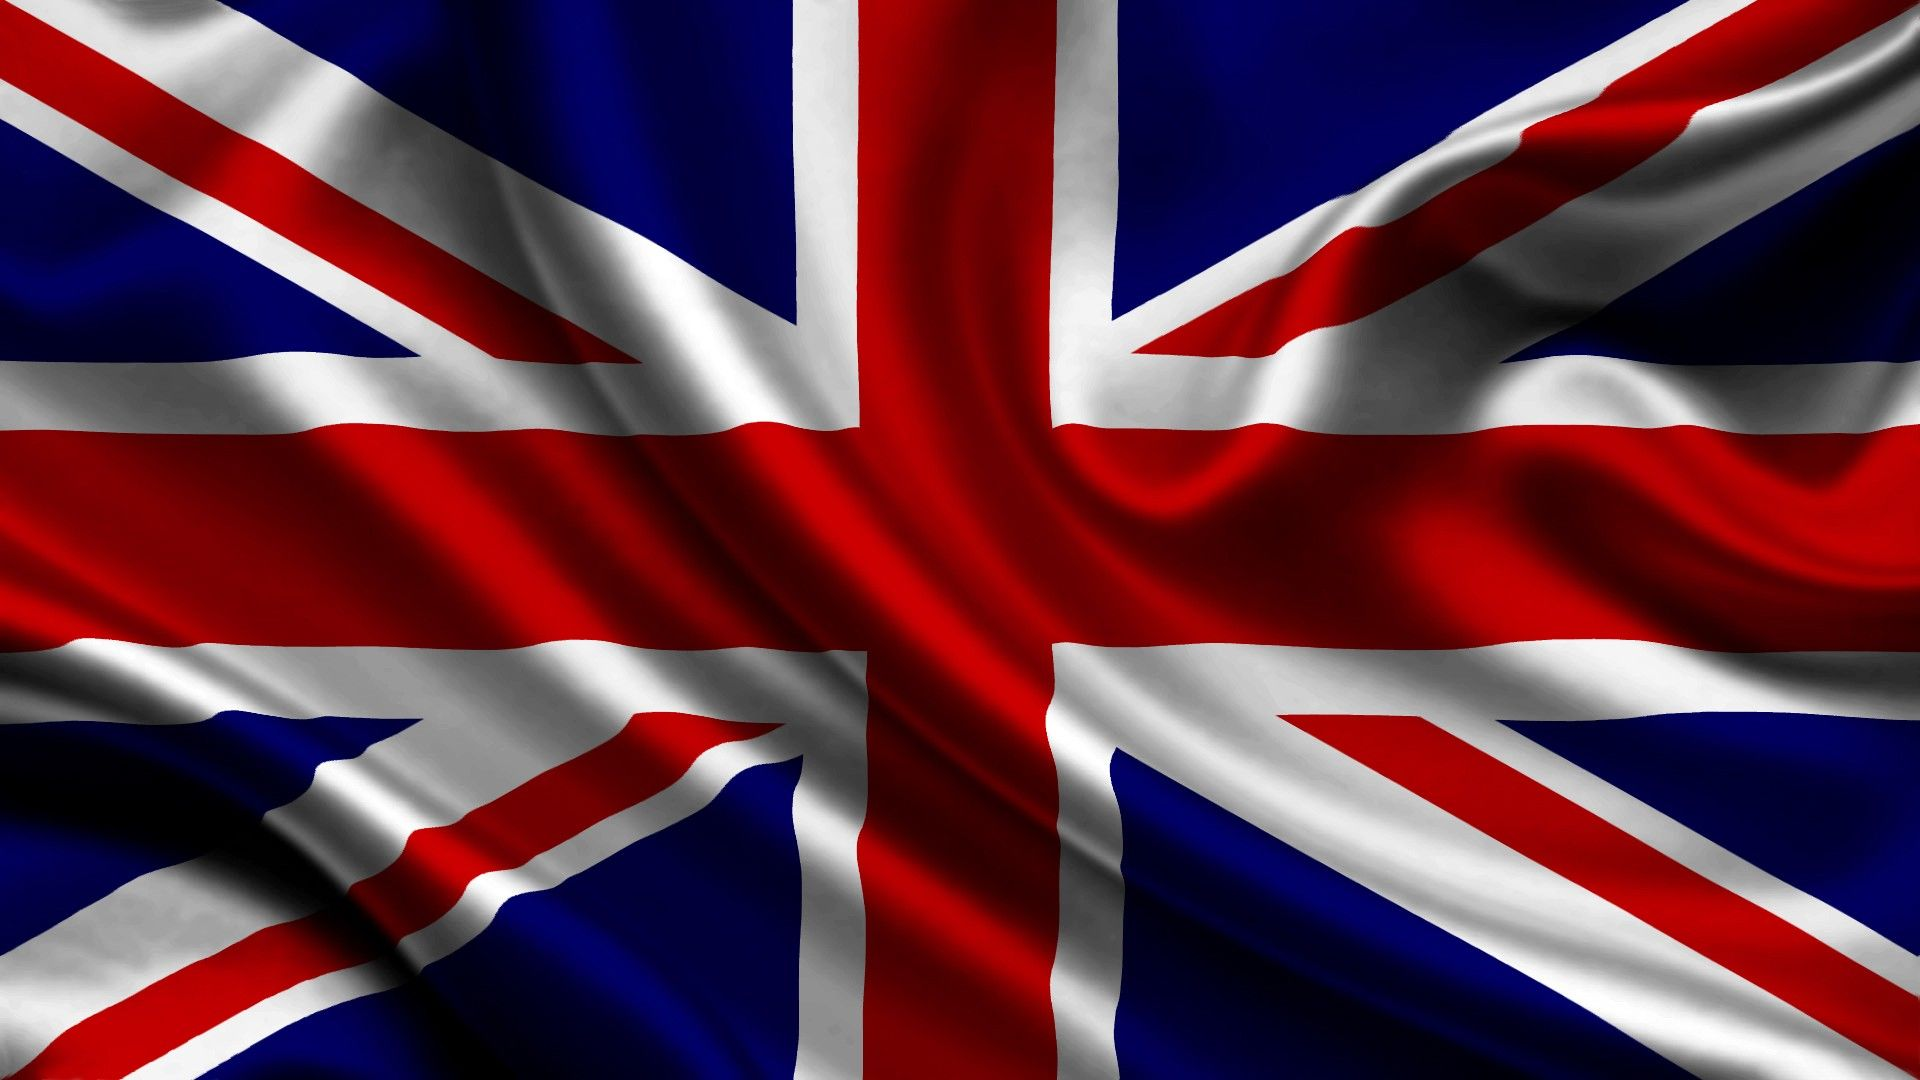 British Flag Wallpaper | Flag | Pinterest | English, Wallpaper ...